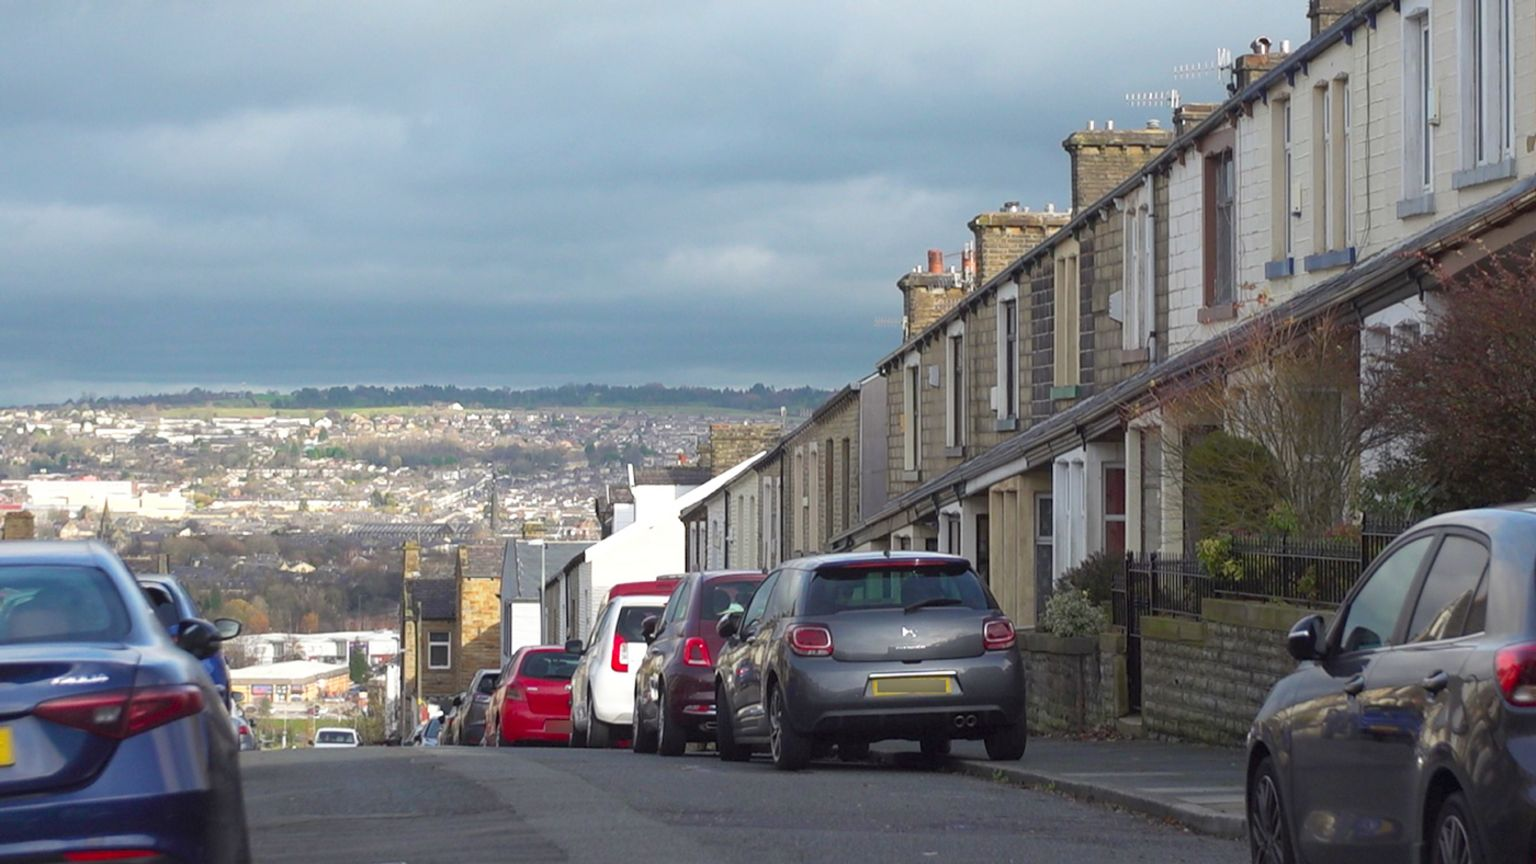 Street in Burnley